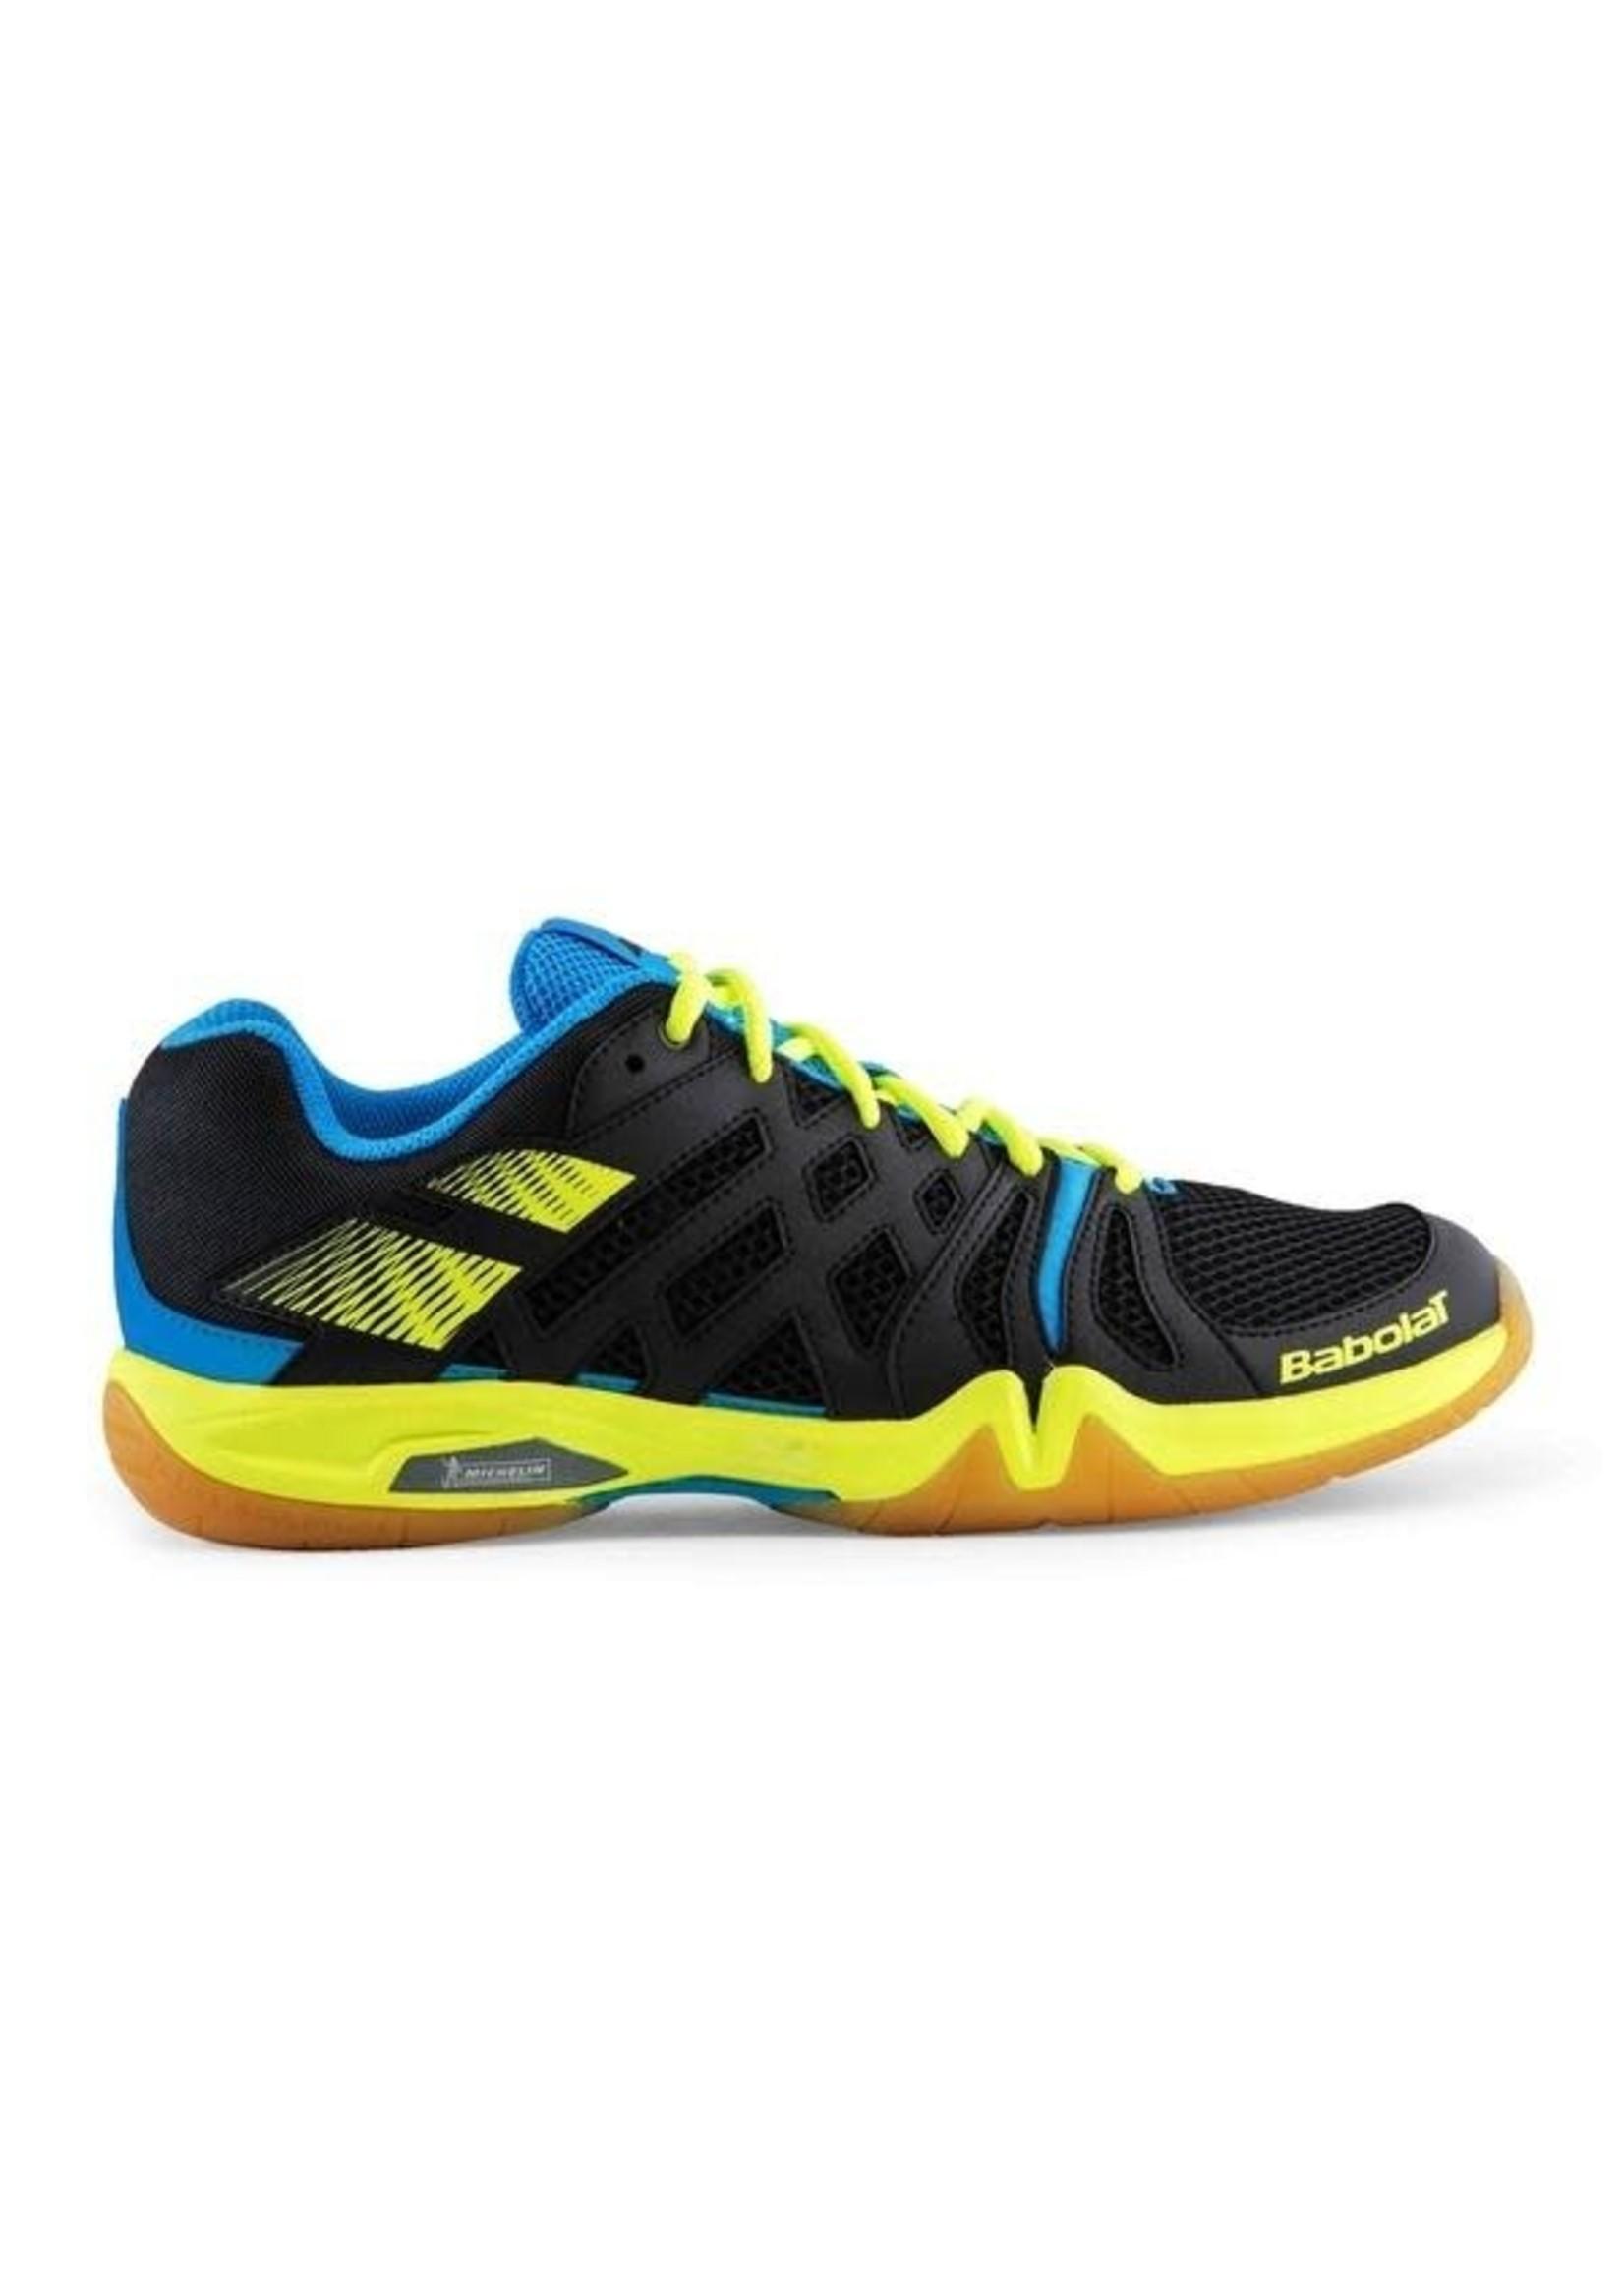 Babolat Babolat Shadow Team Mens Badminton Shoe 7